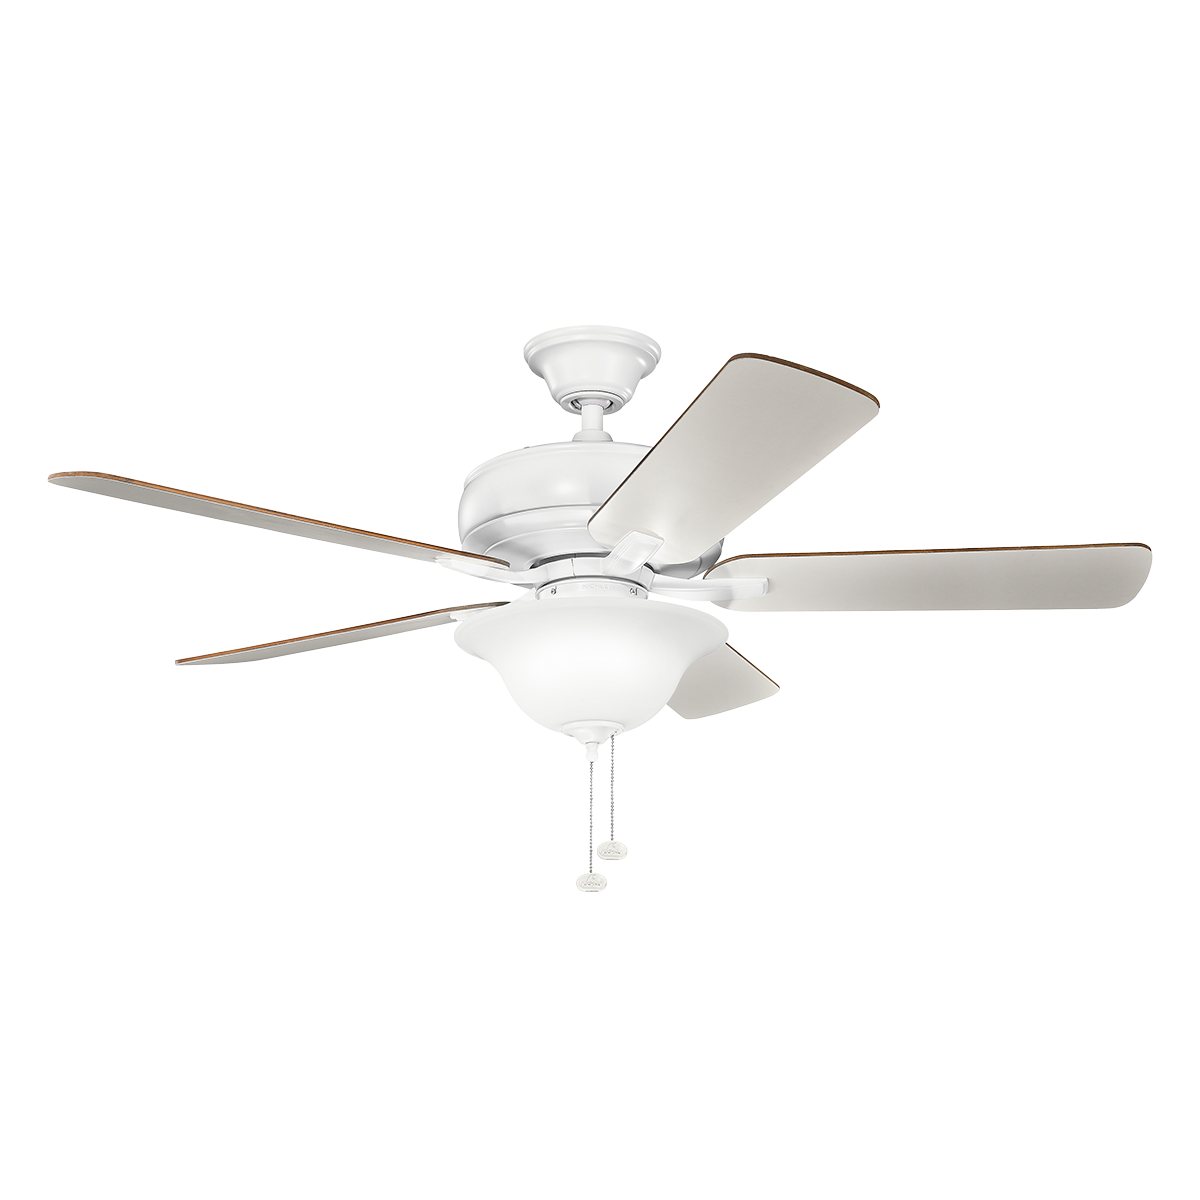 "Blickfang Mwh Savoy Sammlung Von Terra 5 Blade 52"" Select Ceiling Fan"